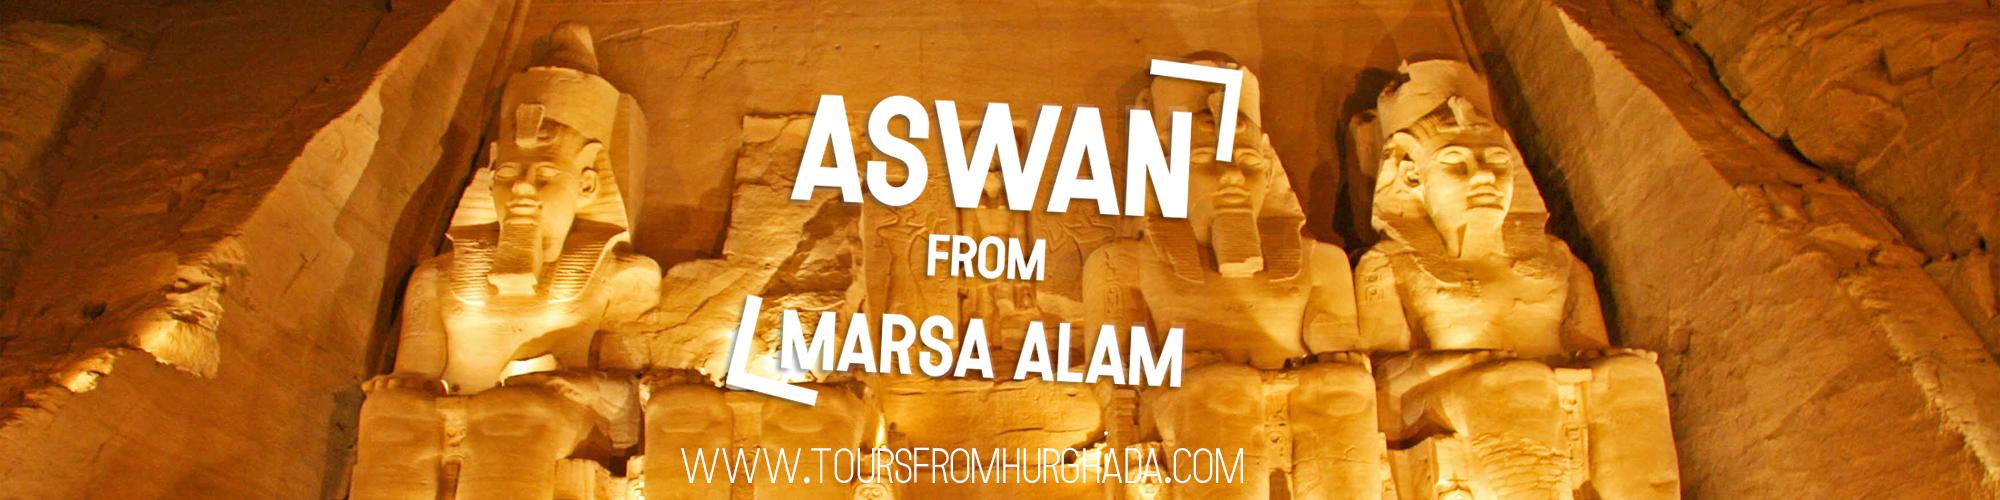 Trips from Marsa Alam to Aswan ToursFromHurghada